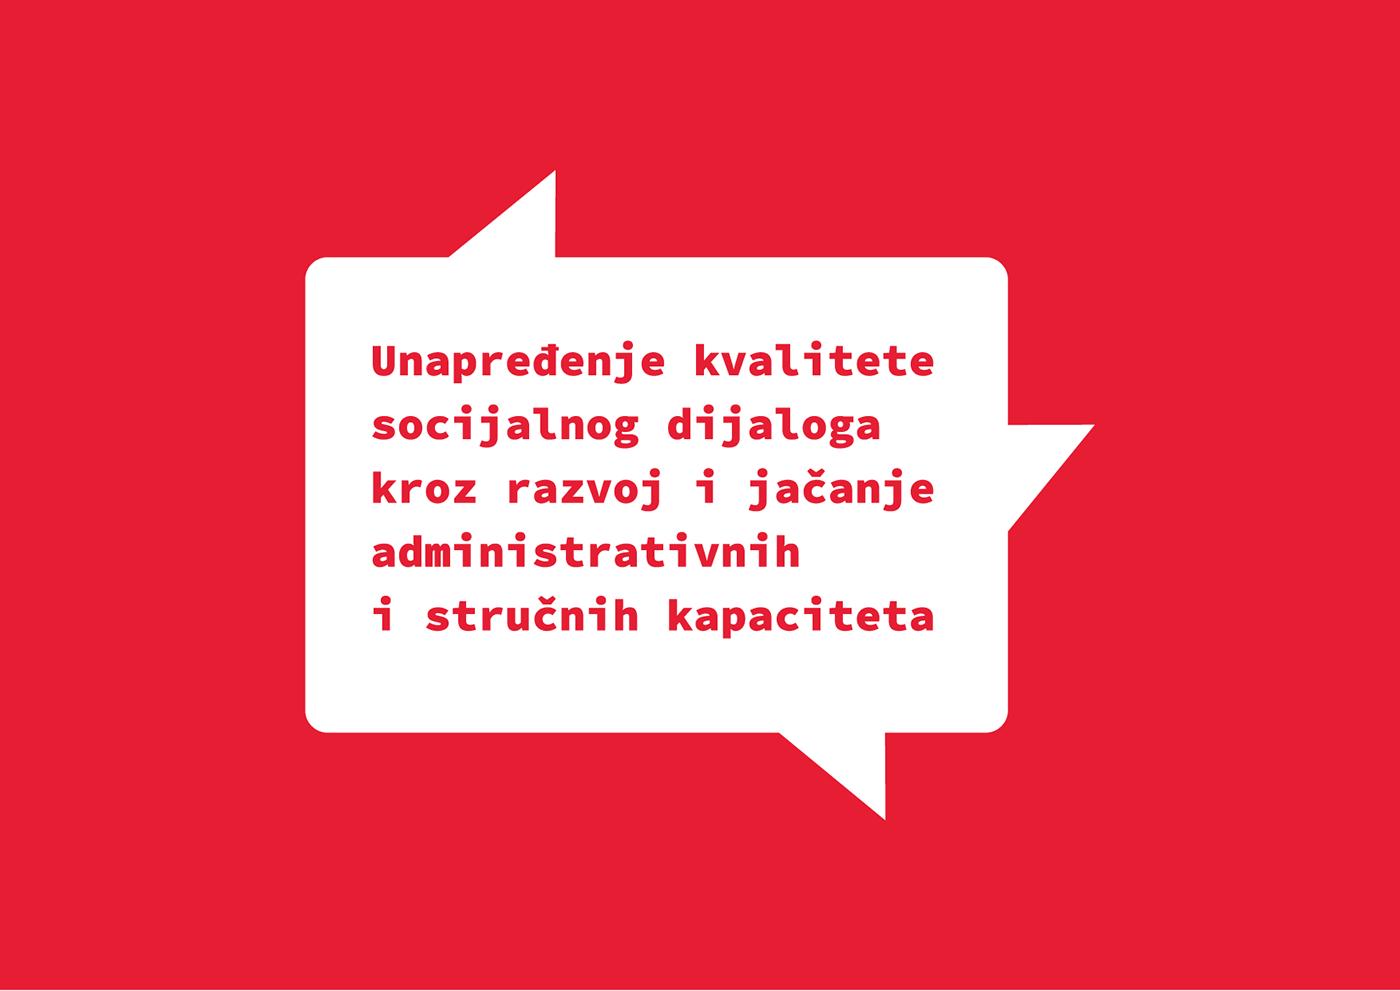 SOMK Sindikat socijalni dijalog radnička prava mediji kultura obrazovanje